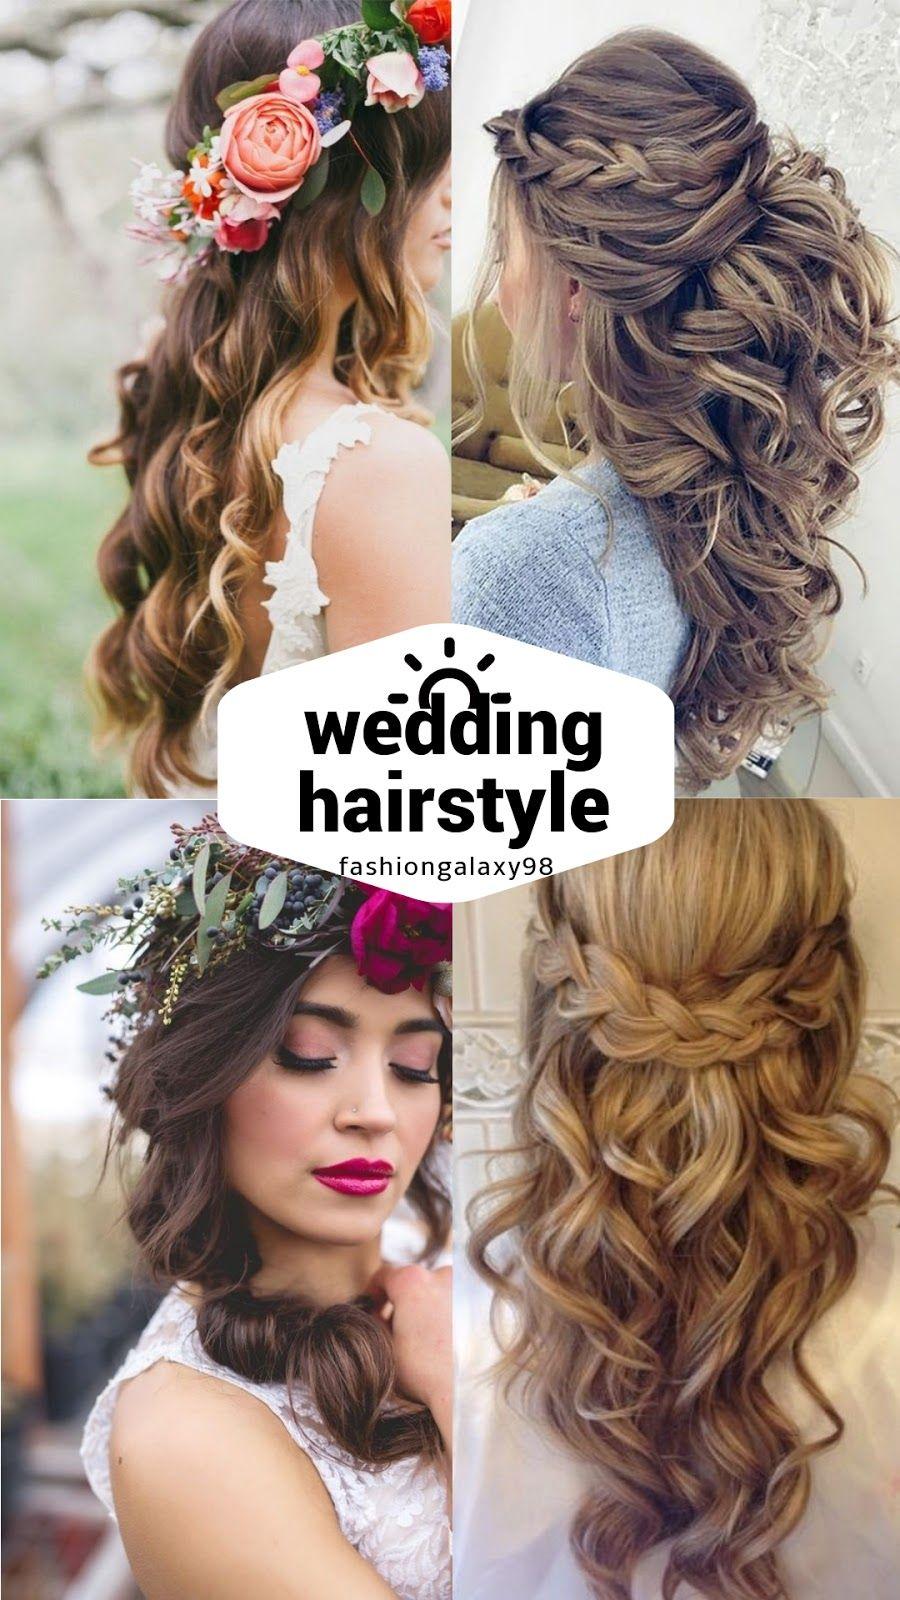 Romenic Wedding Hairstyle Ideally Youre Wedding Hairstyle Should - Peinados-ala-moda-2015